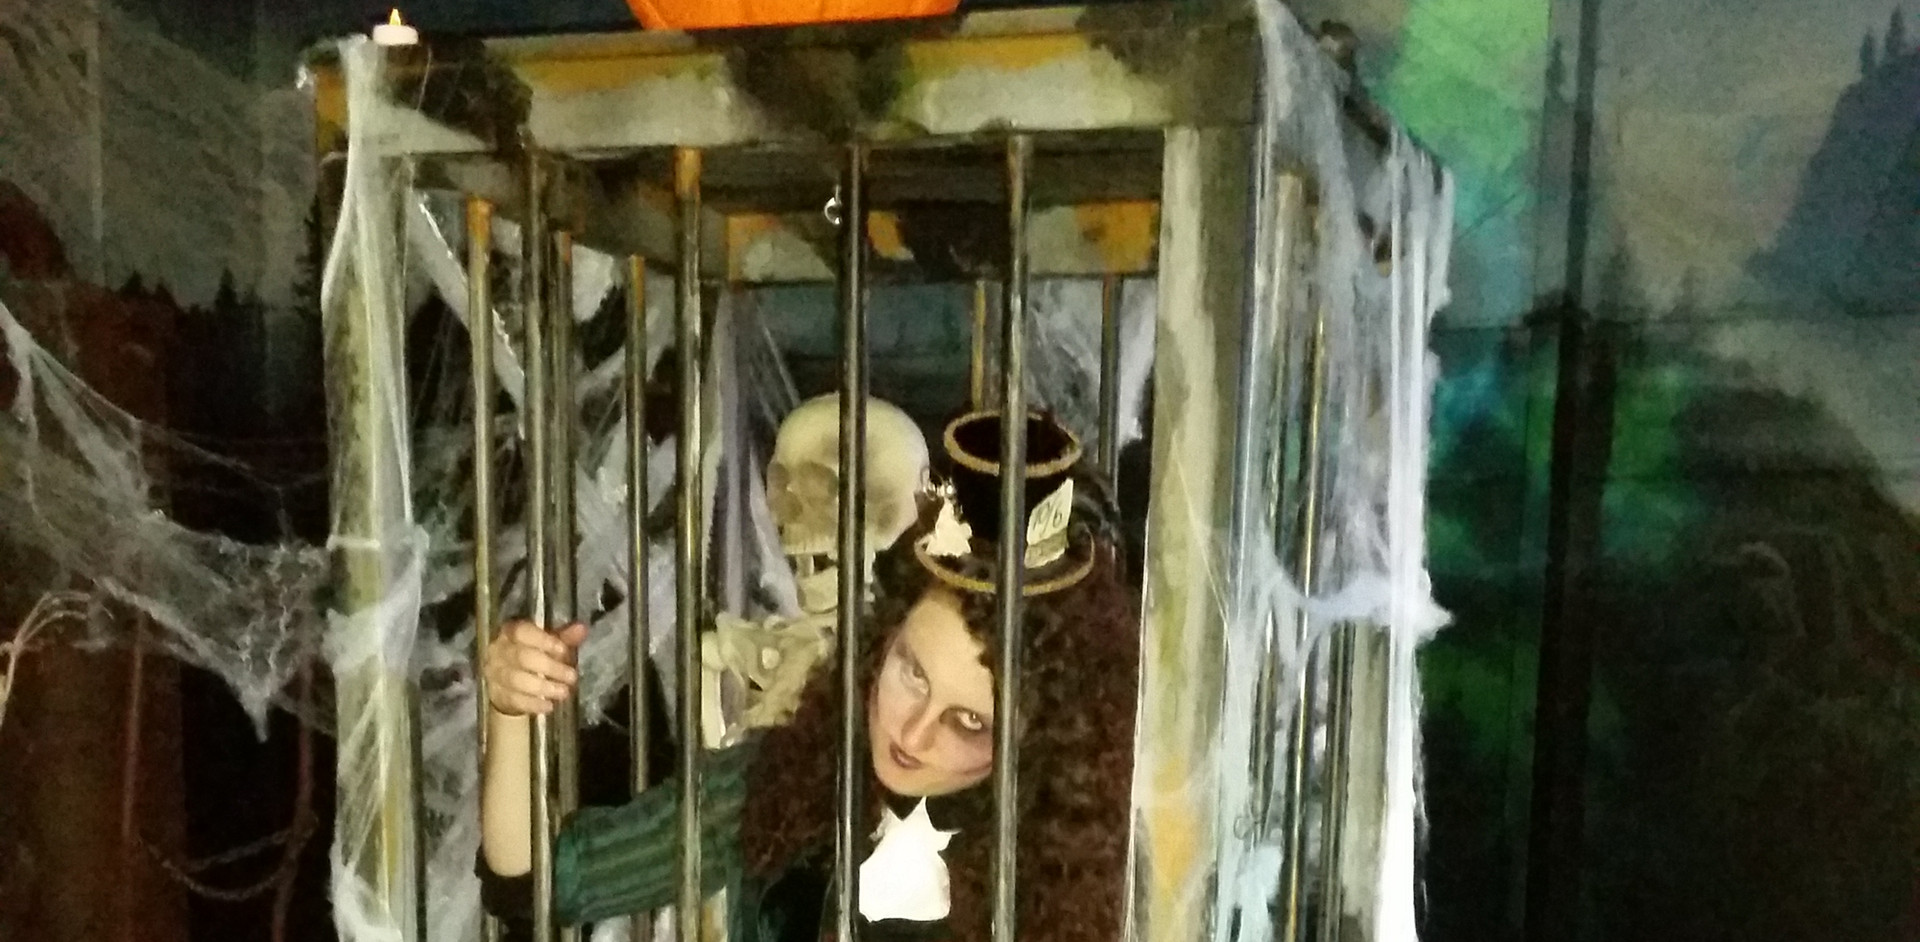 Halloween cage